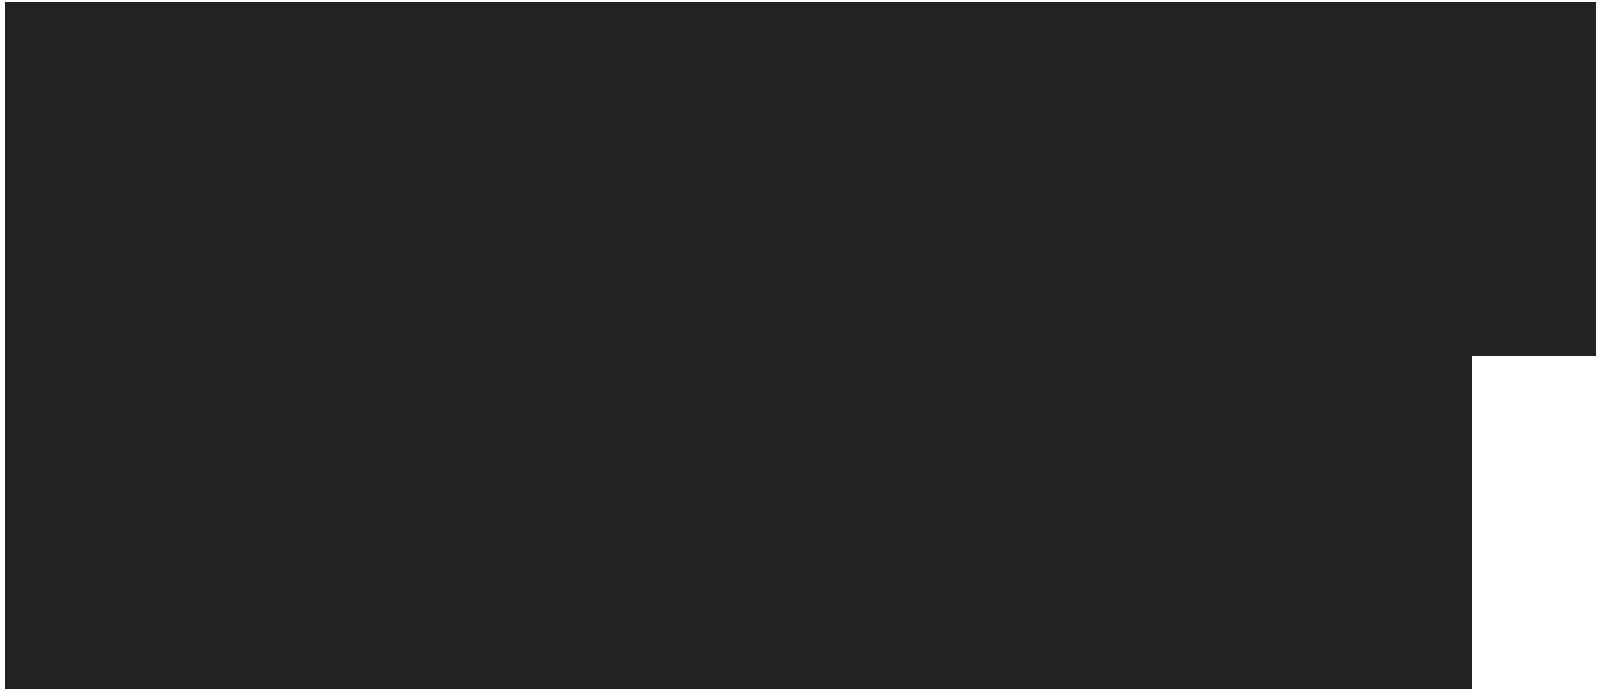 Jonathan Guajardo